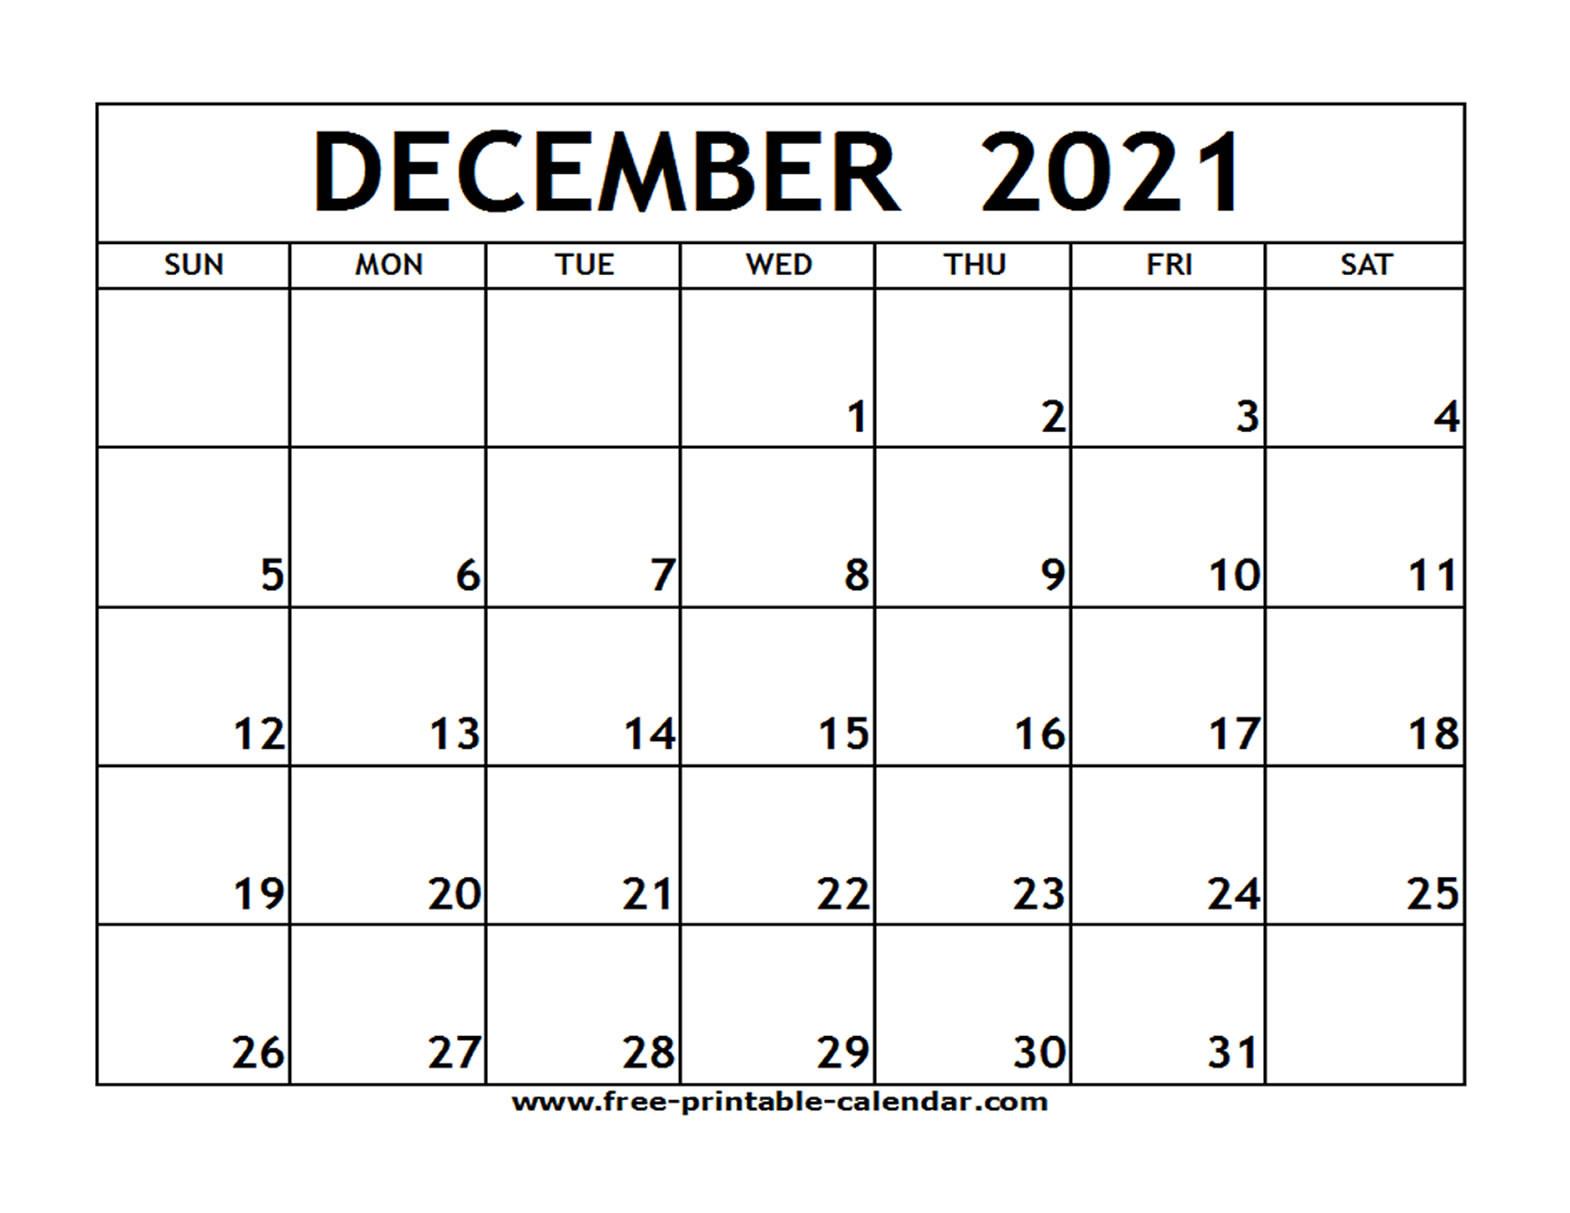 Dec 2021 Printable Calendar   Free Printable Calendar-Free Printable Calendar 2021 Monthly